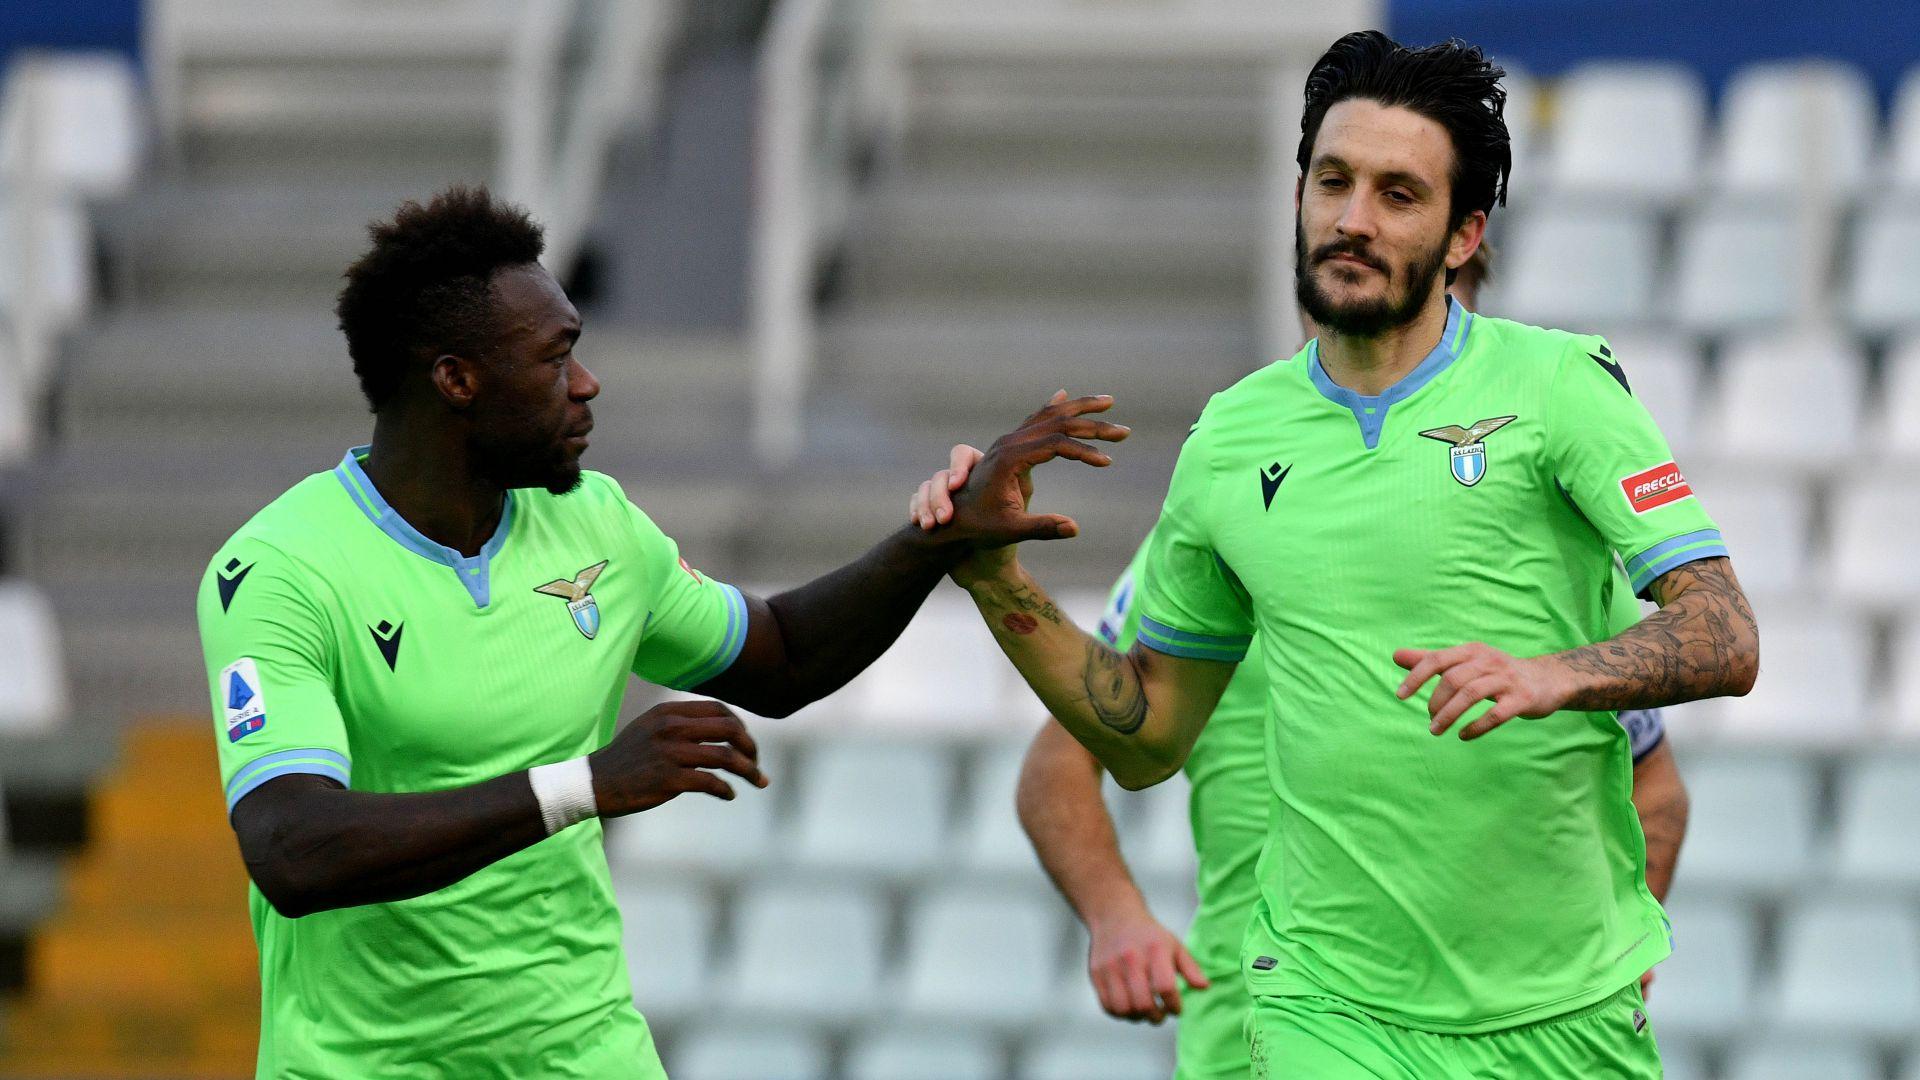 Parma-Lazio 0-2: al Tardini decidono Luis Alberto e Caicedo